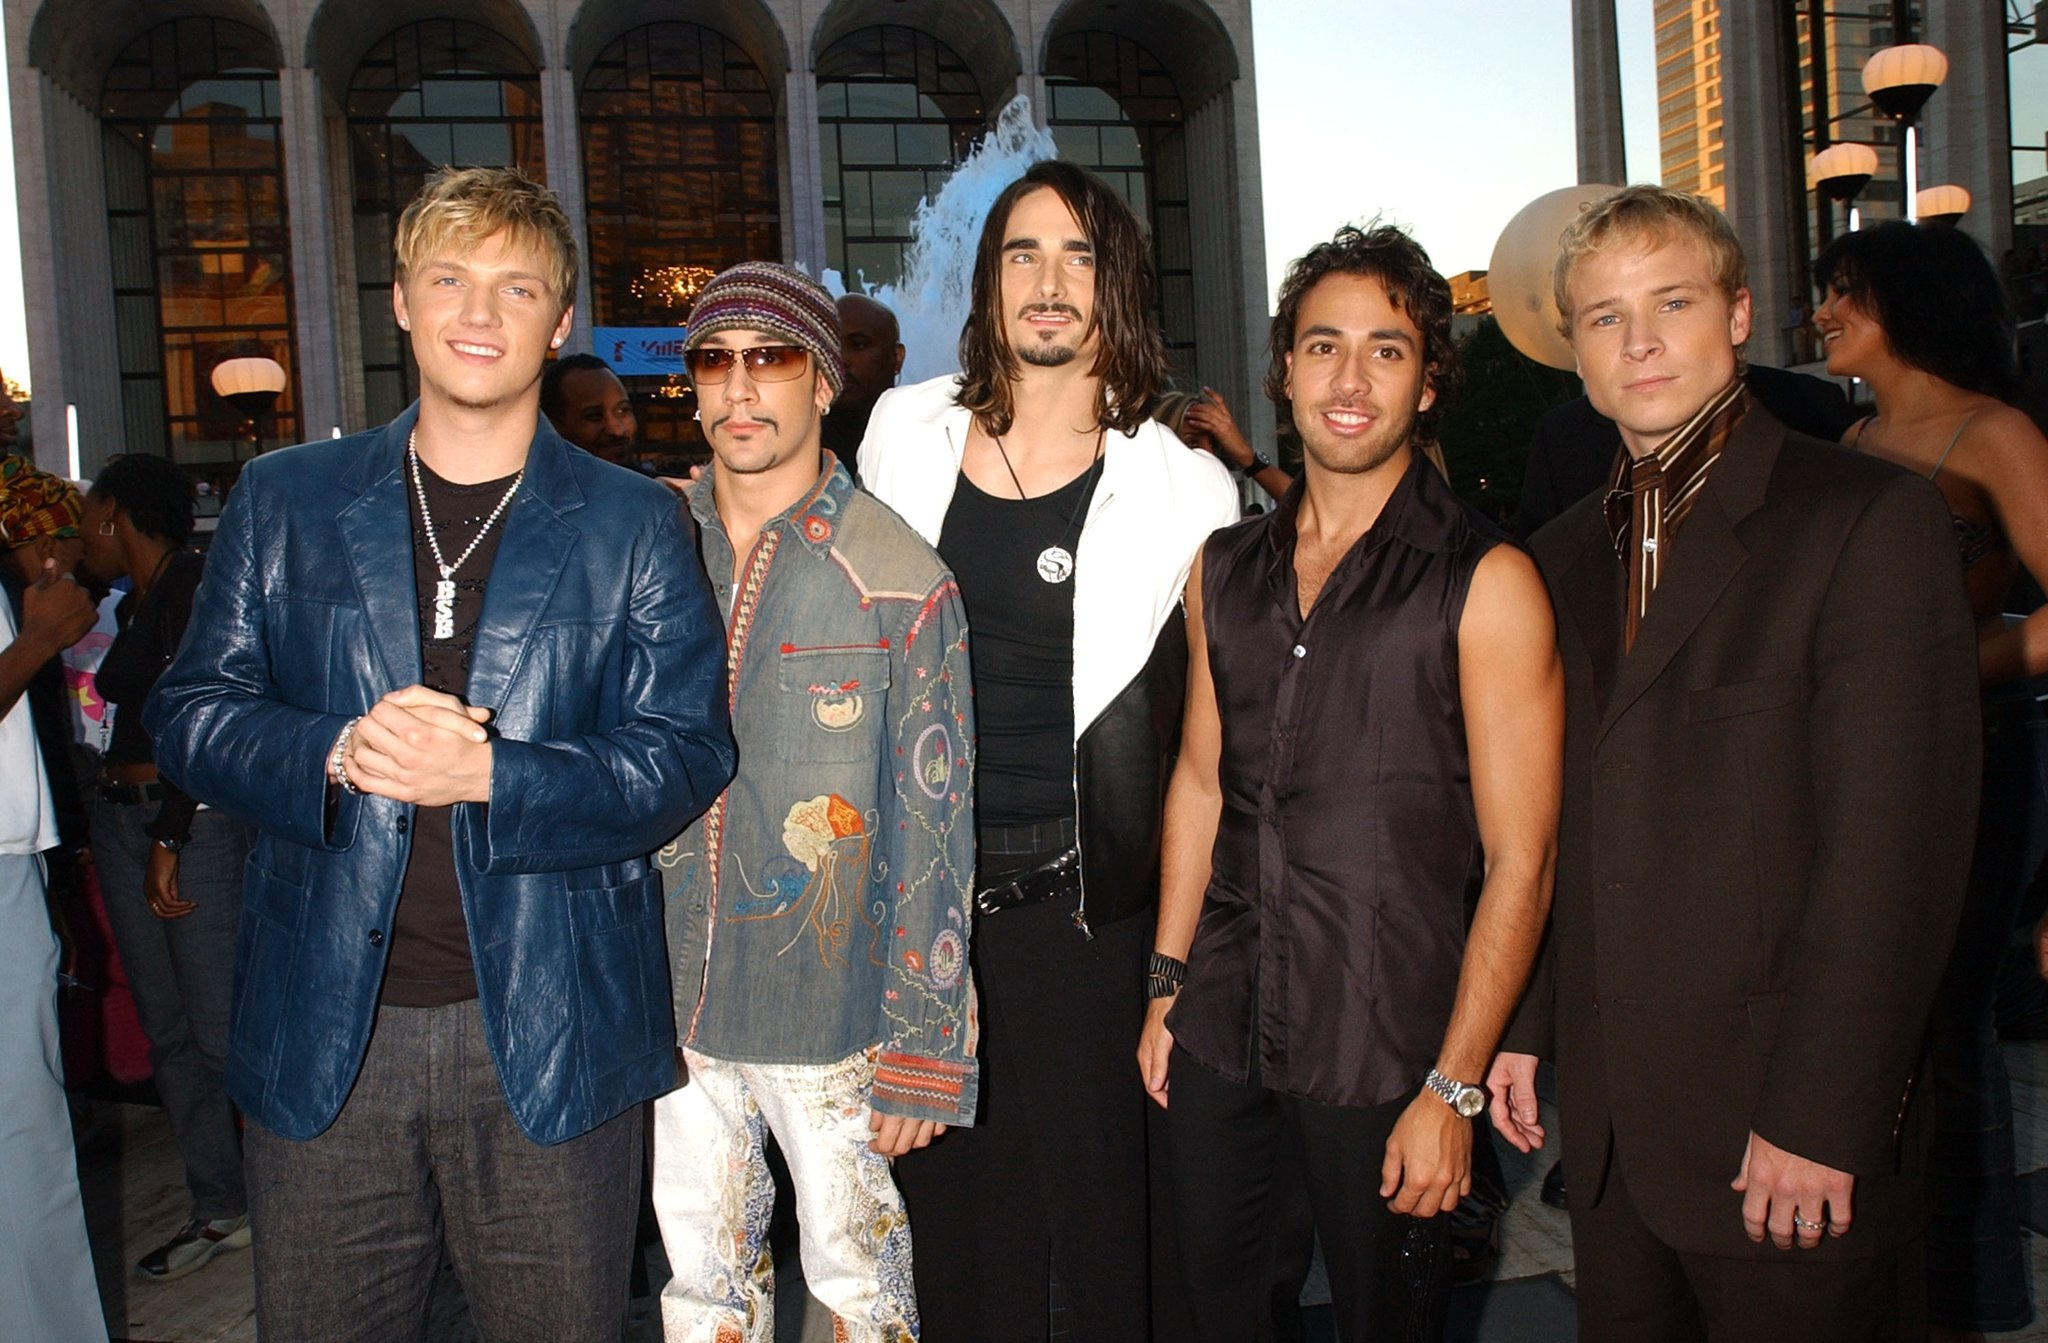 Backstreet Boys Images